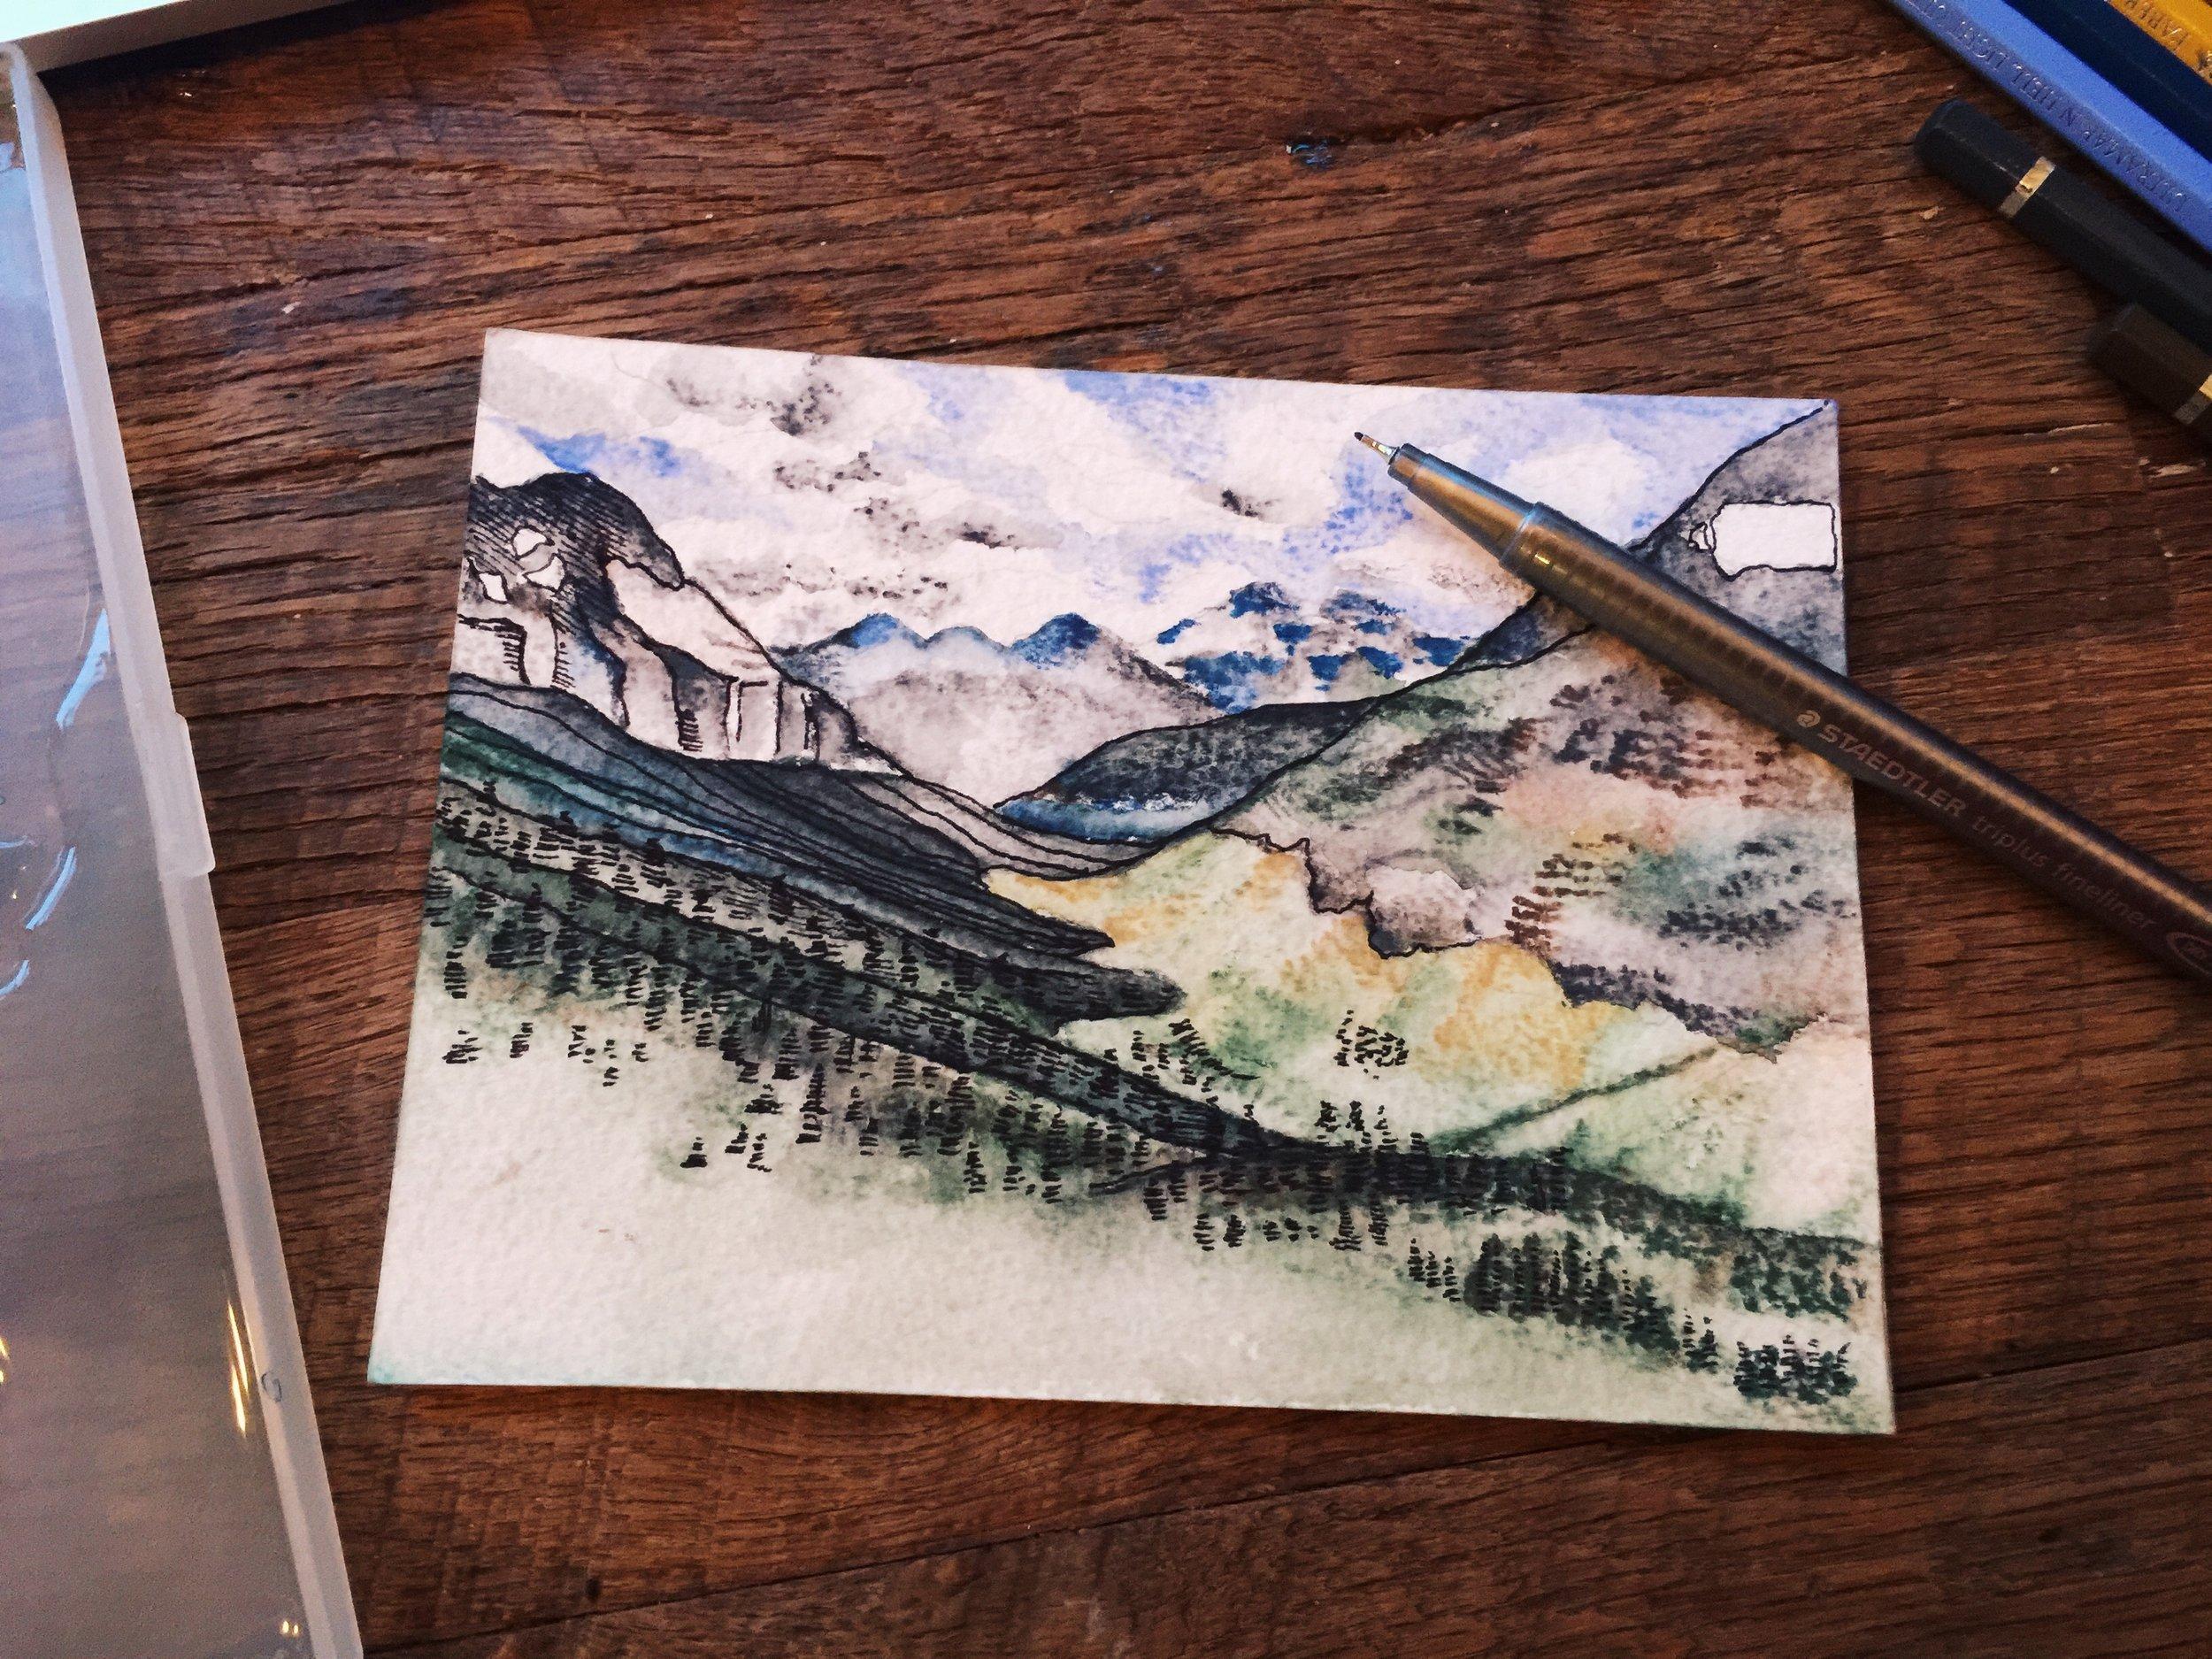 Postcard in progress